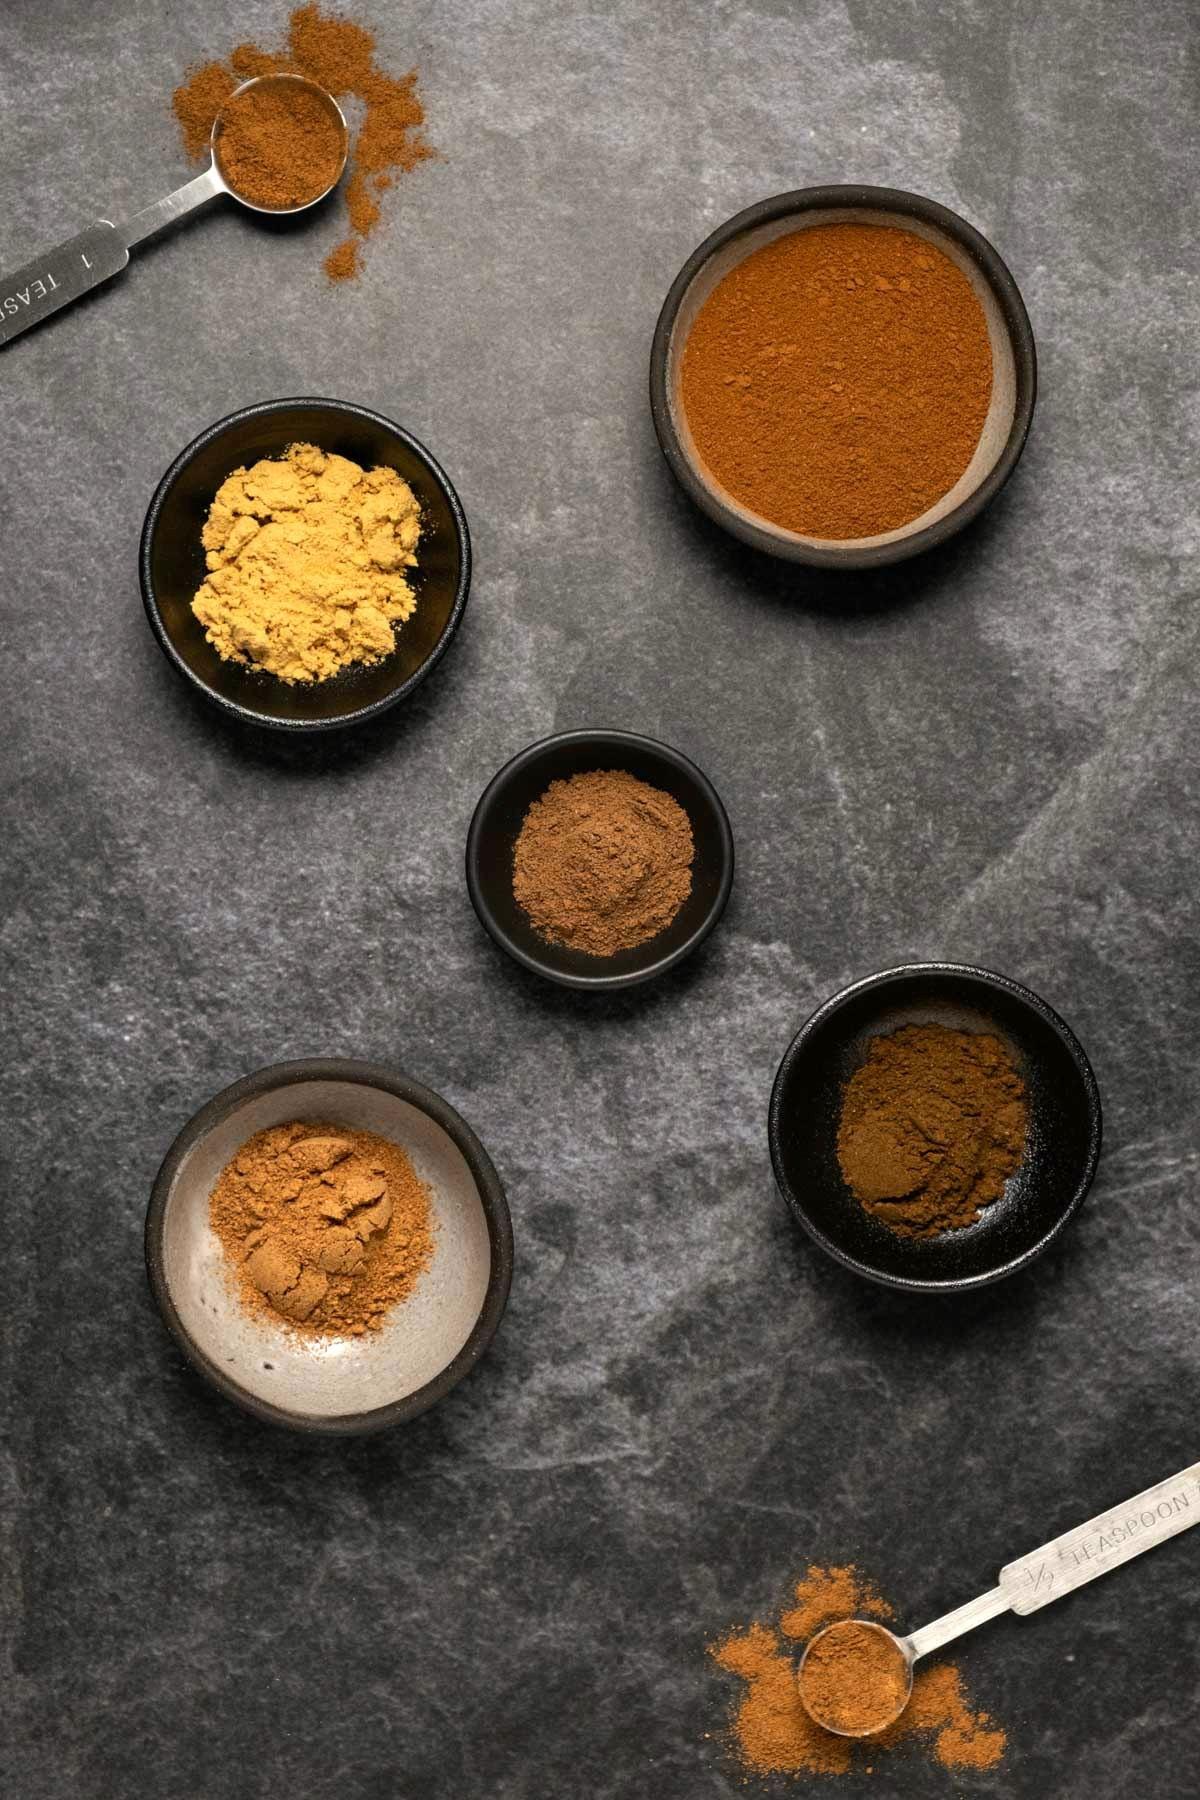 Ingredients for making pumpkin spice.